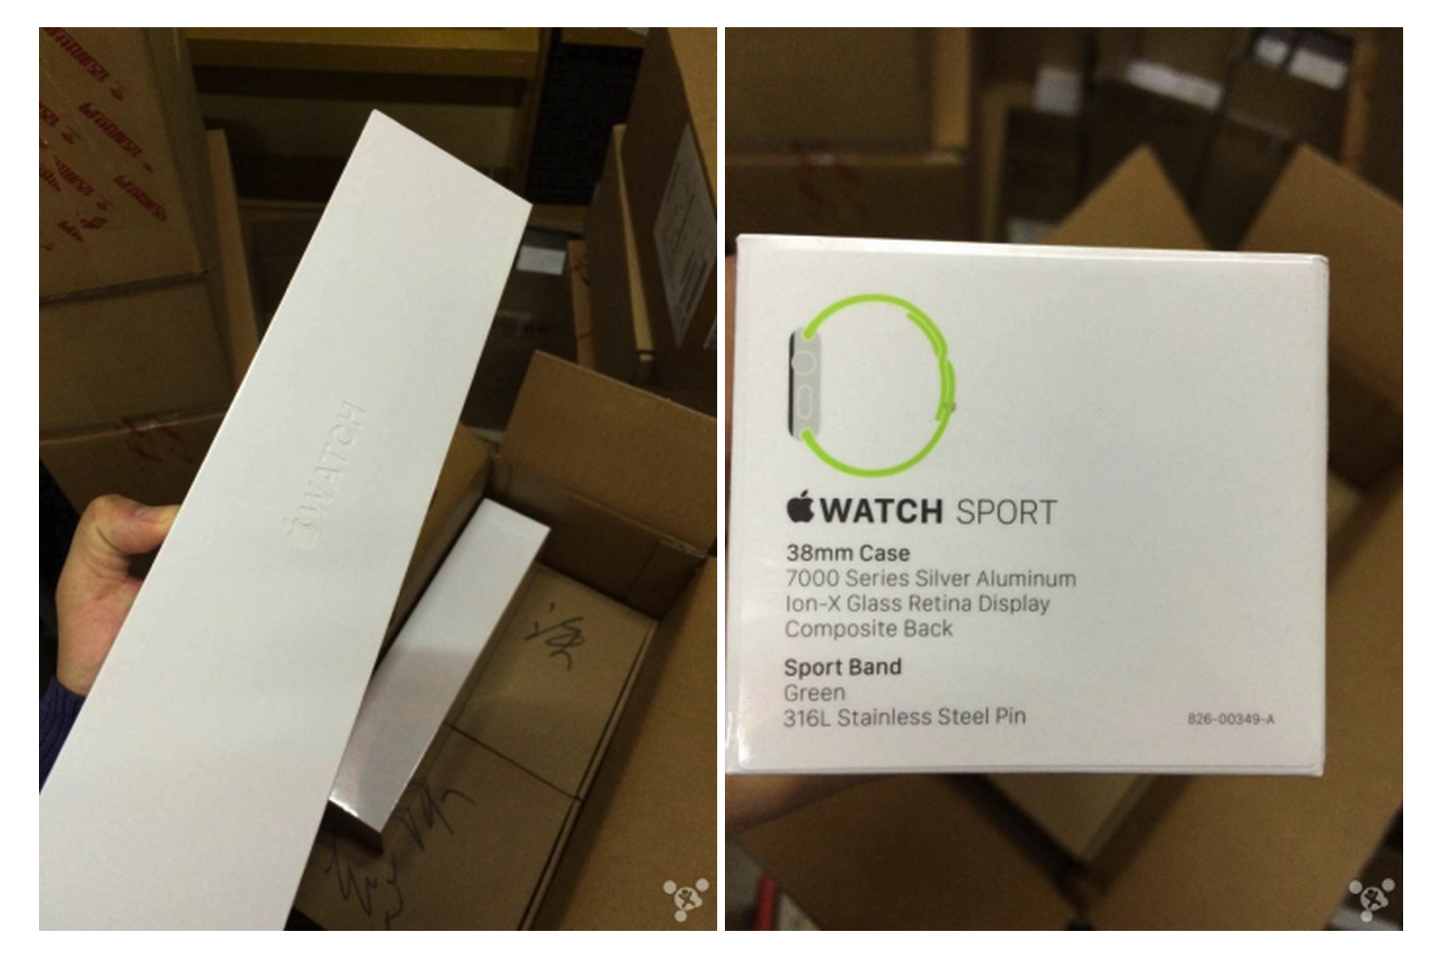 Apple watch sport boxes